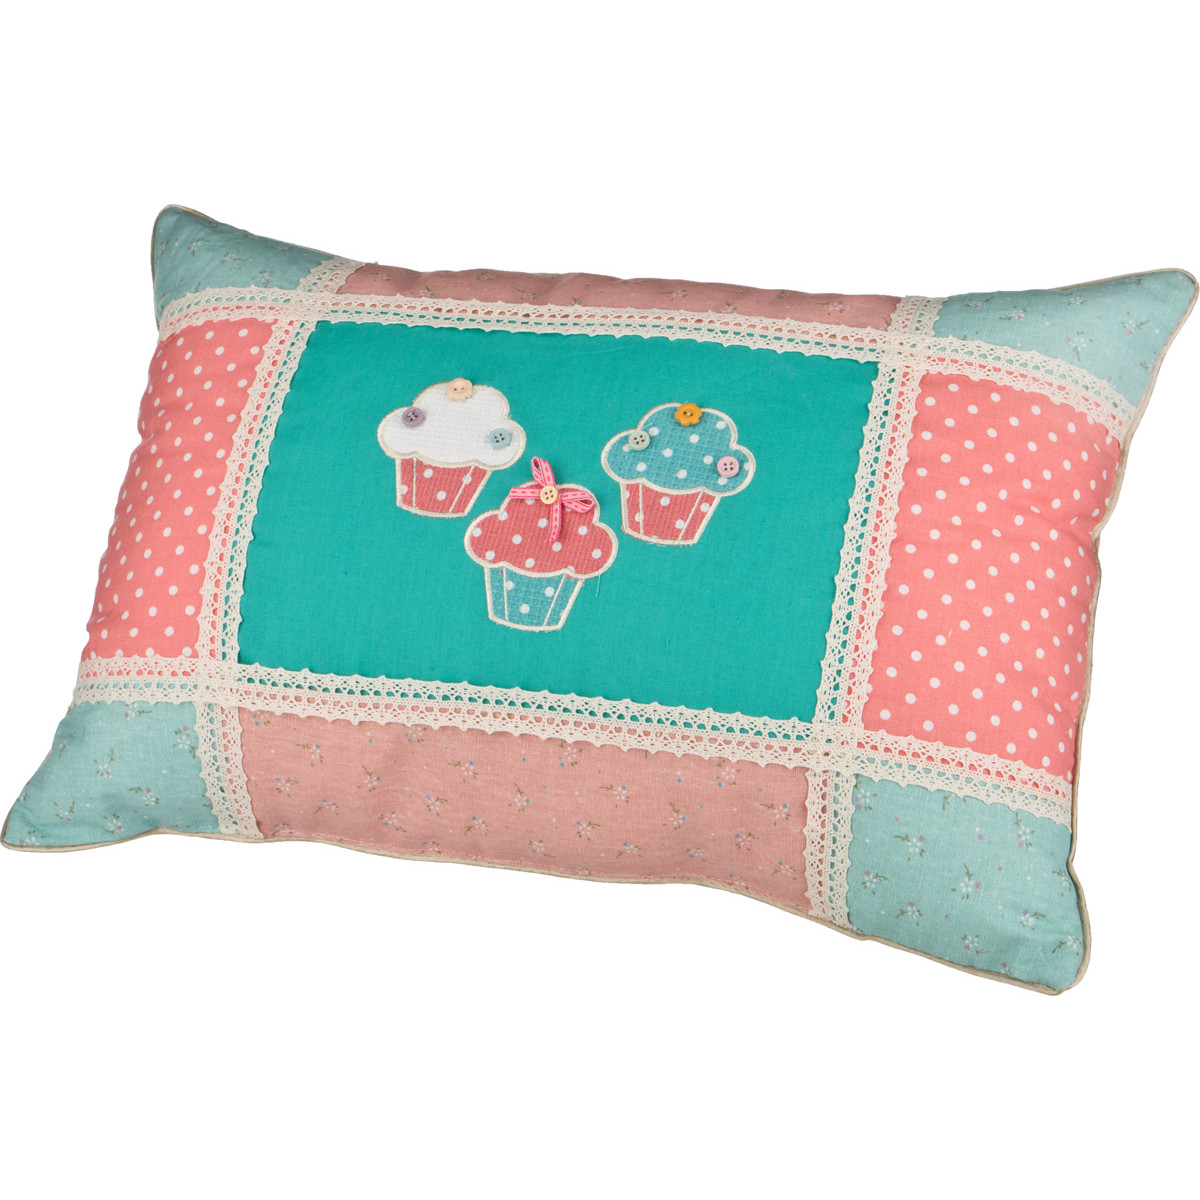 Декоративные подушки Santalino Декоративная подушка Jonna (40х55) подушка декоративная santalino райский сад 850 818 6